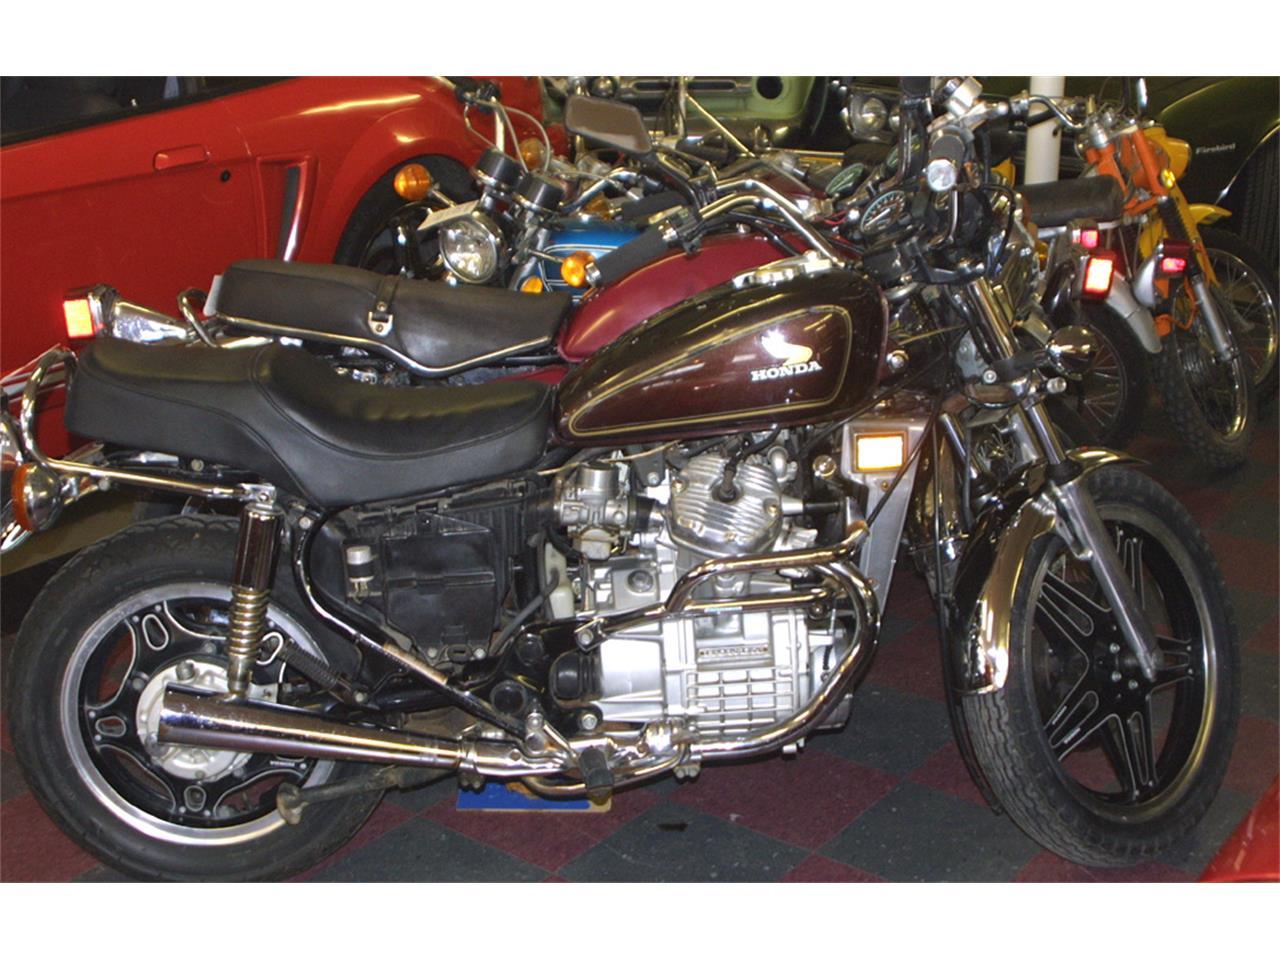 1978 Honda Motorcycle (CC-1191953) for sale in Carnation, Washington